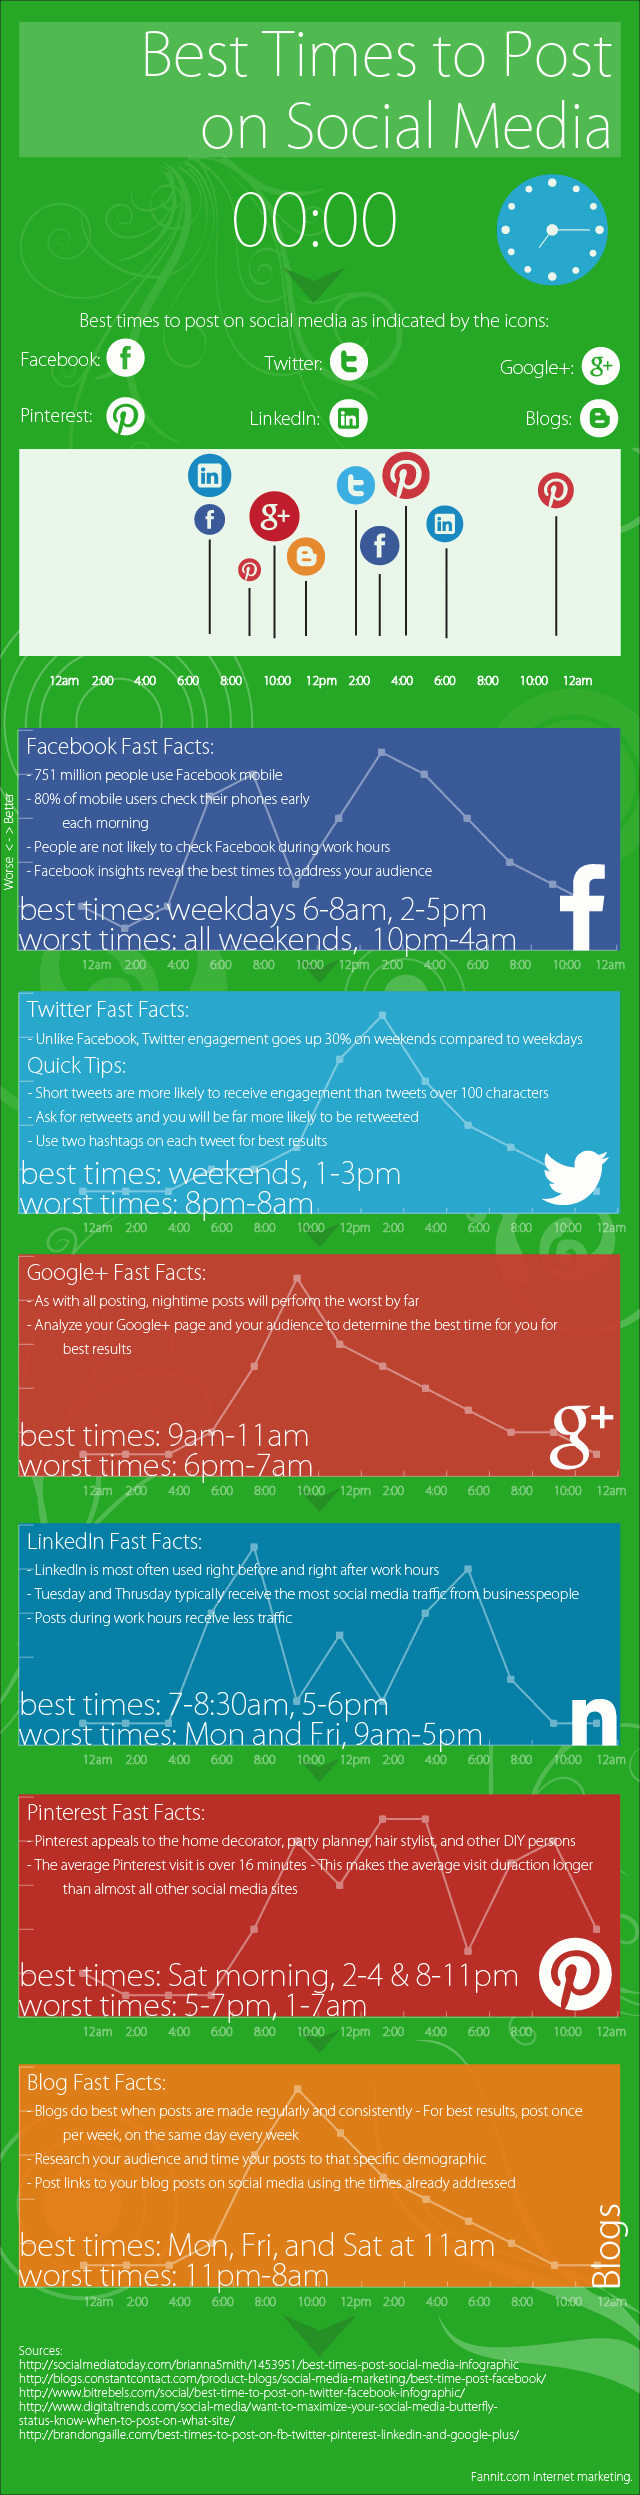 Best time to post on Google+ facebook twitter Linkedin Pinterest